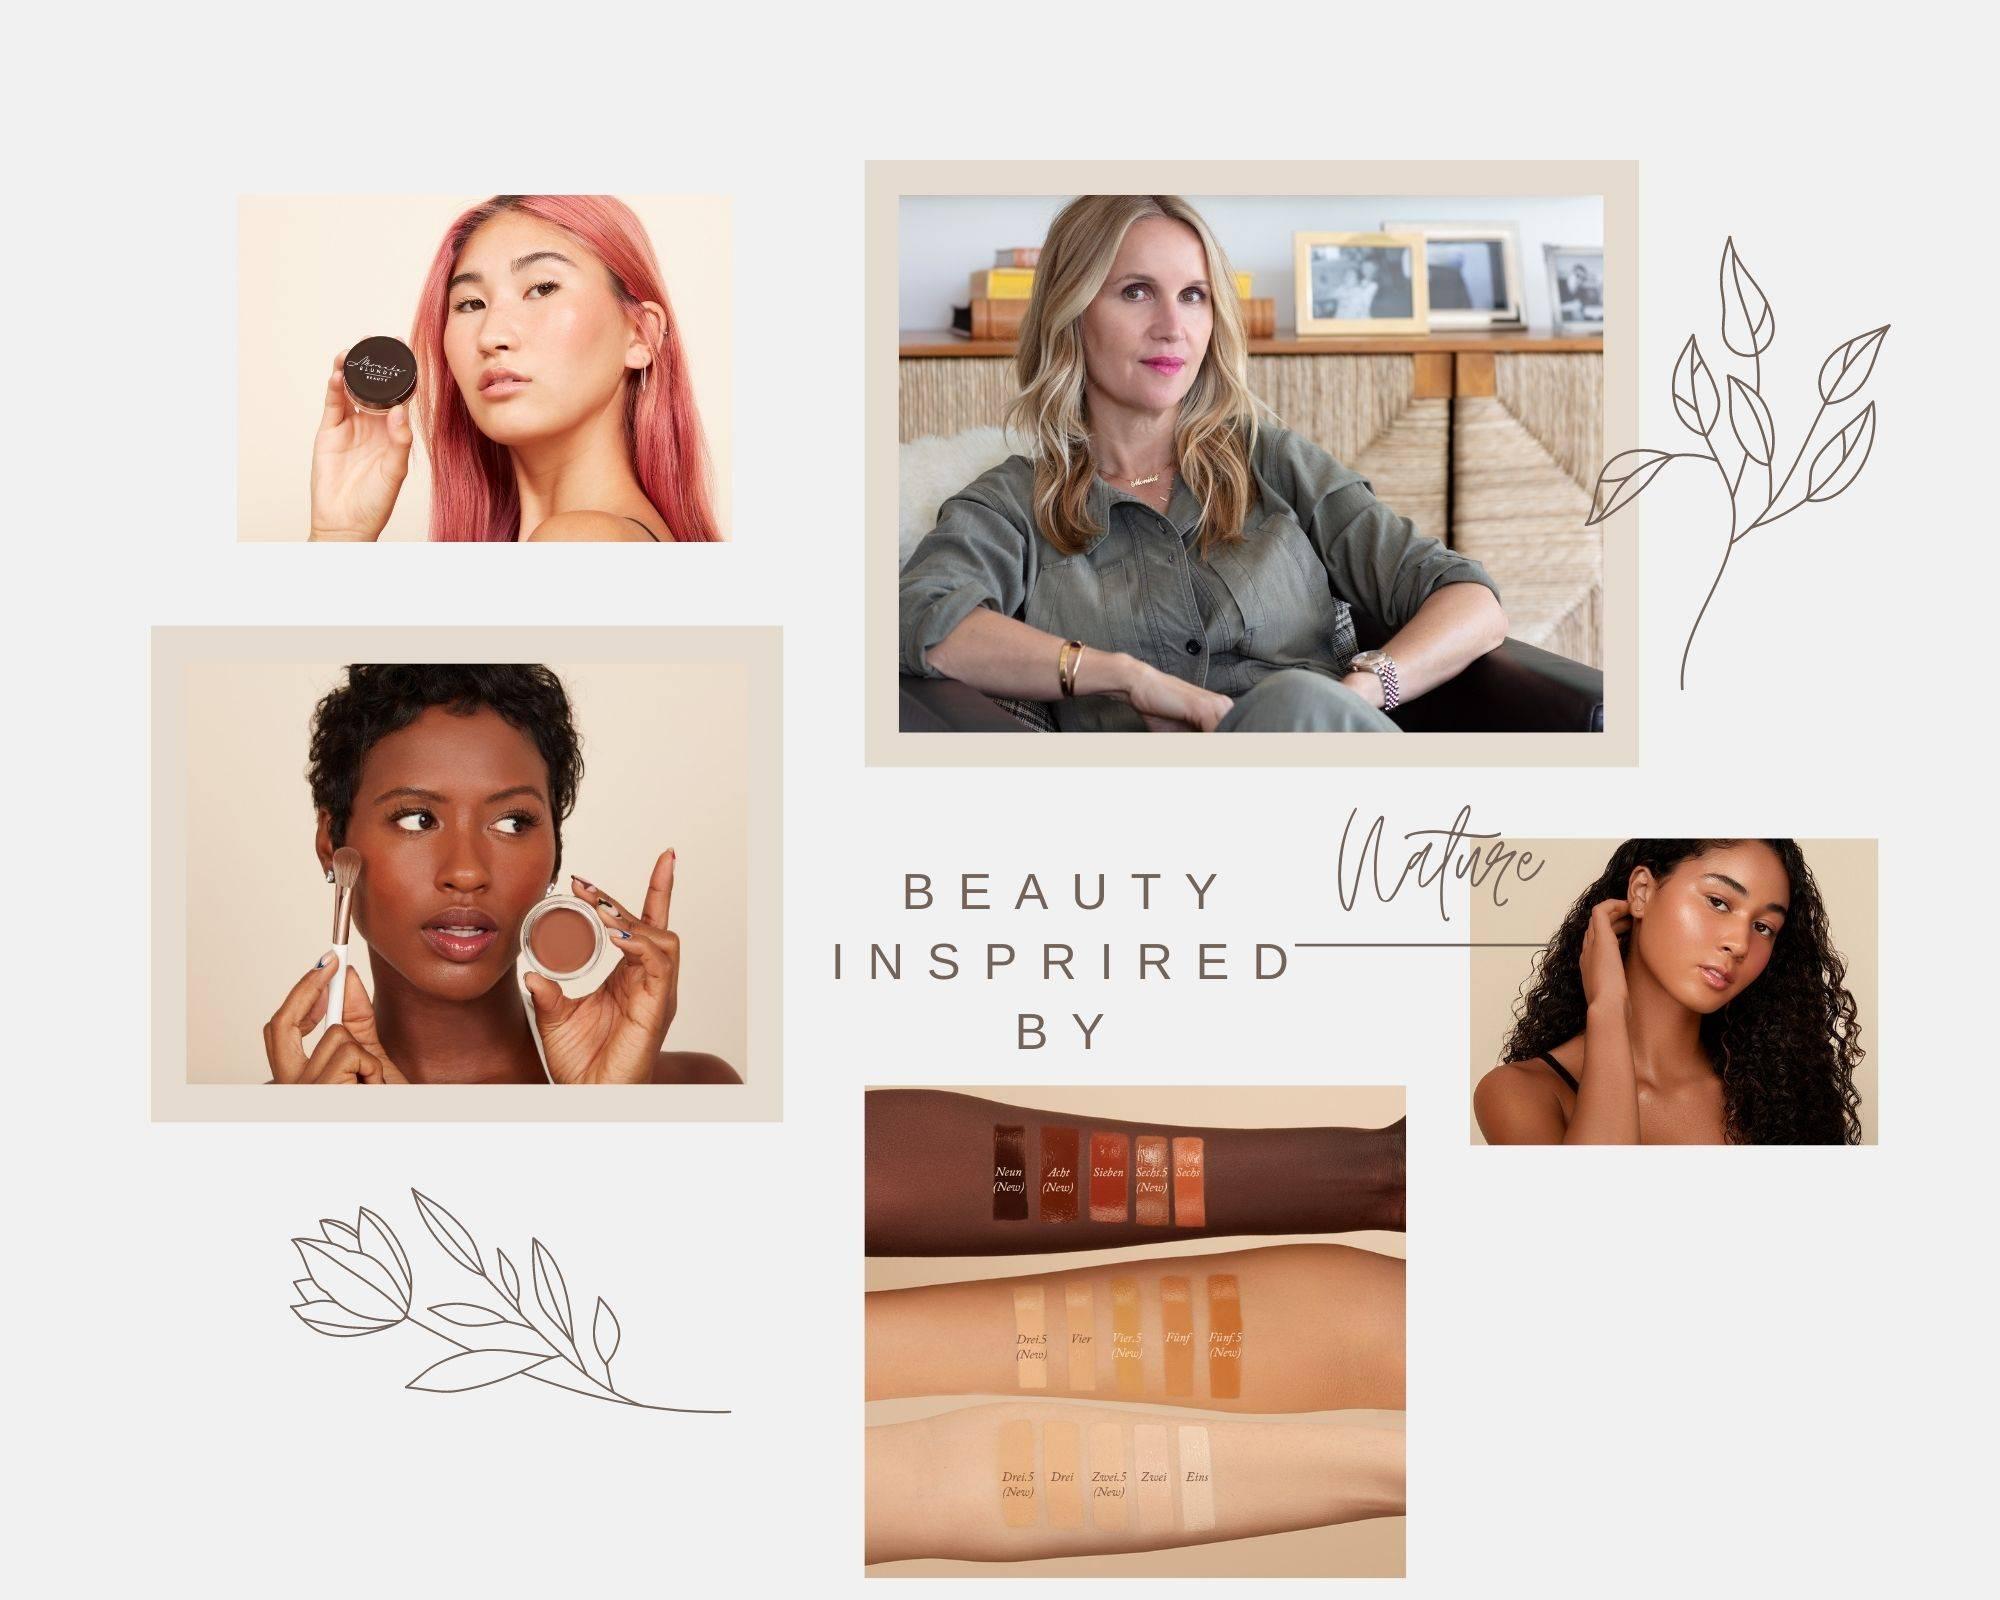 Monika Blunder Beauty About Us